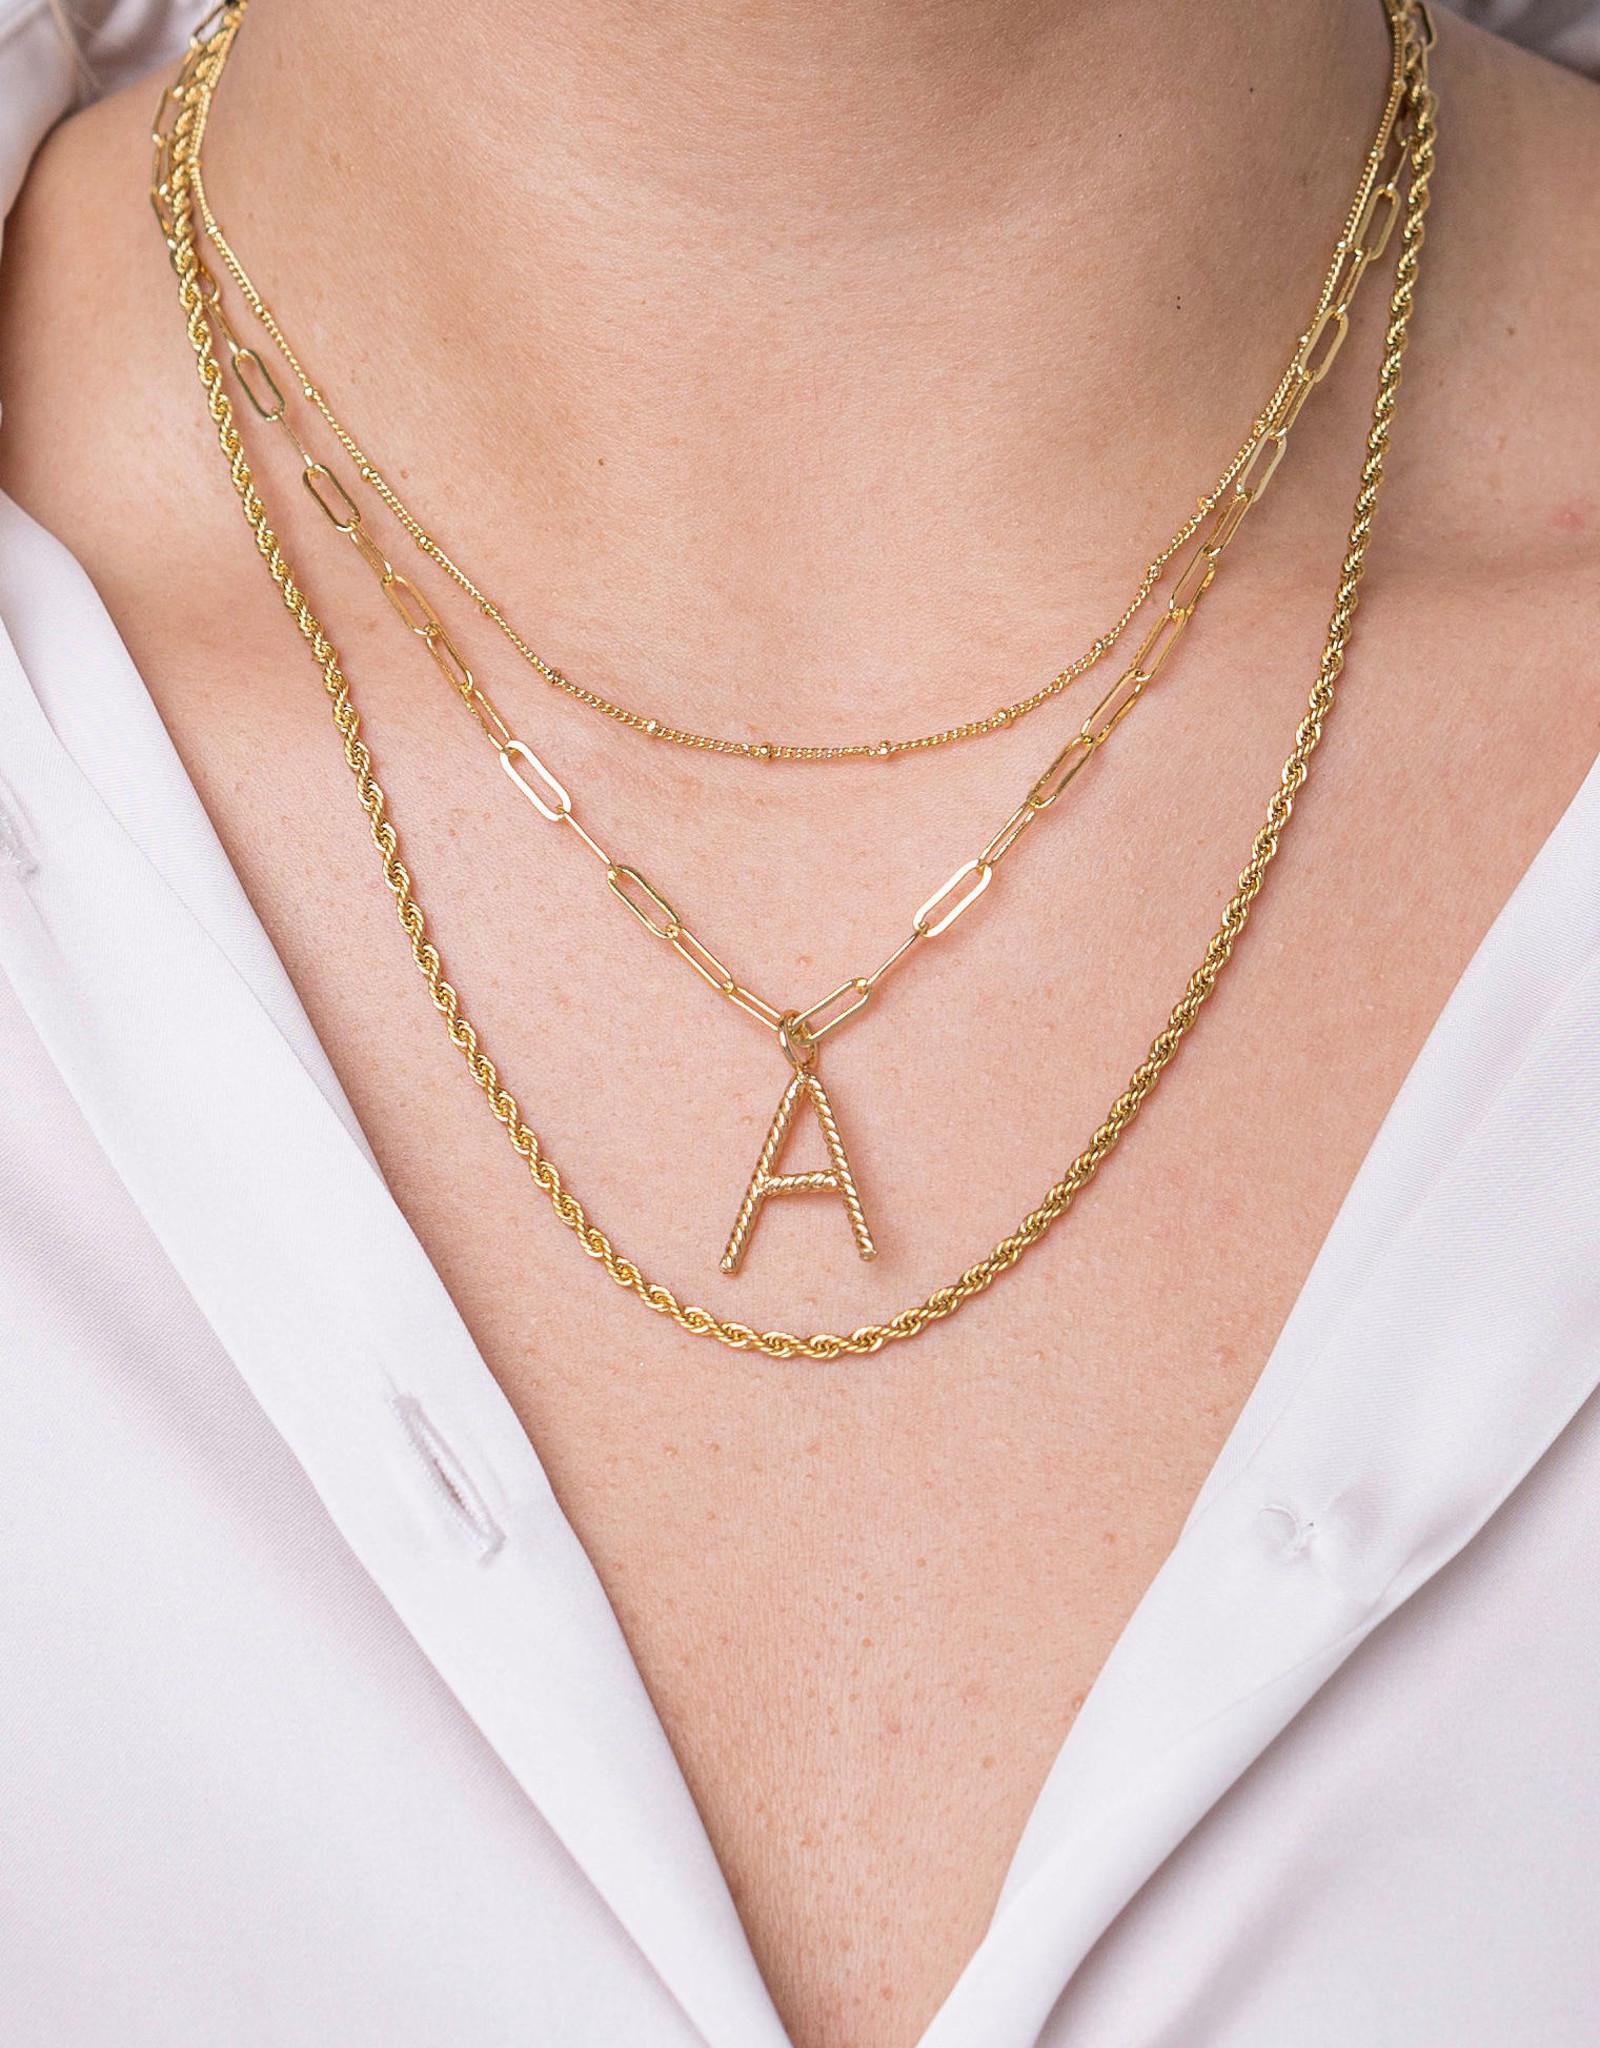 Aspen Initial Necklace